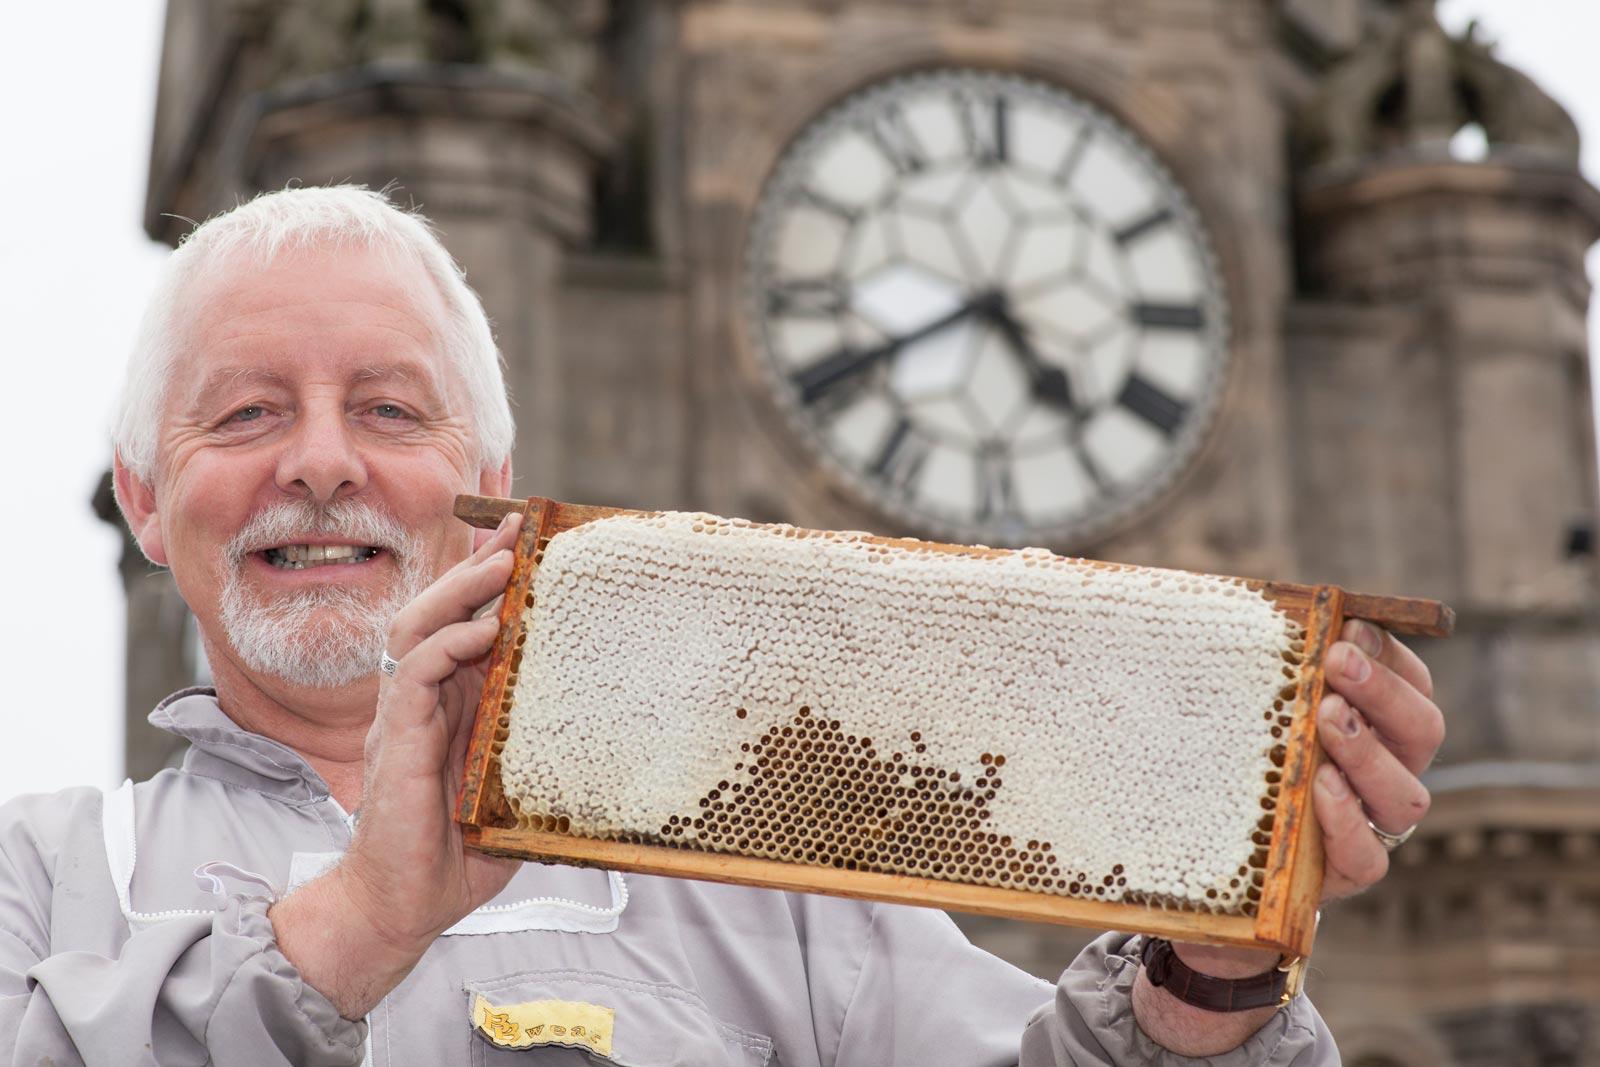 Scottish Honey Beekeeper Brian Pool at the Balmoral, Edinburgh